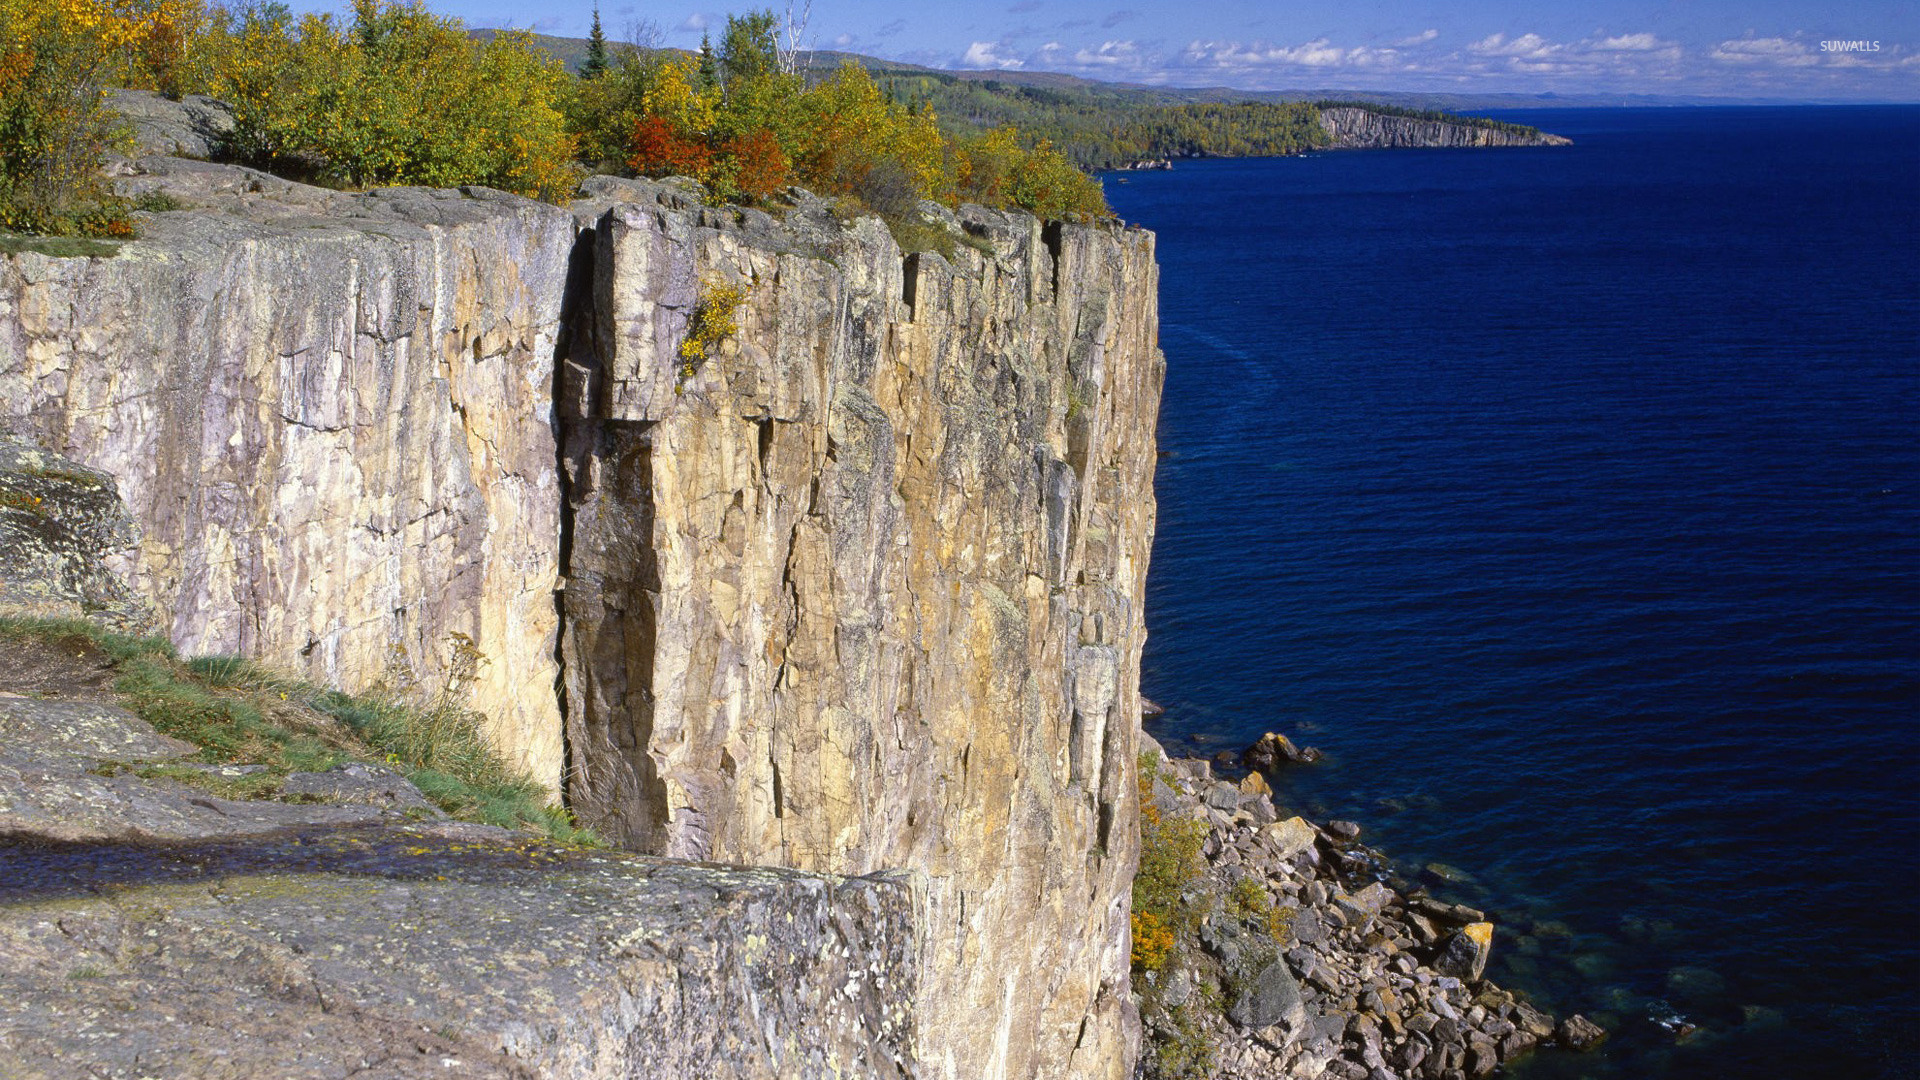 Fall Mountain Scenery Wallpaper Palisade Head Lake Superior Wallpaper Nature Wallpapers